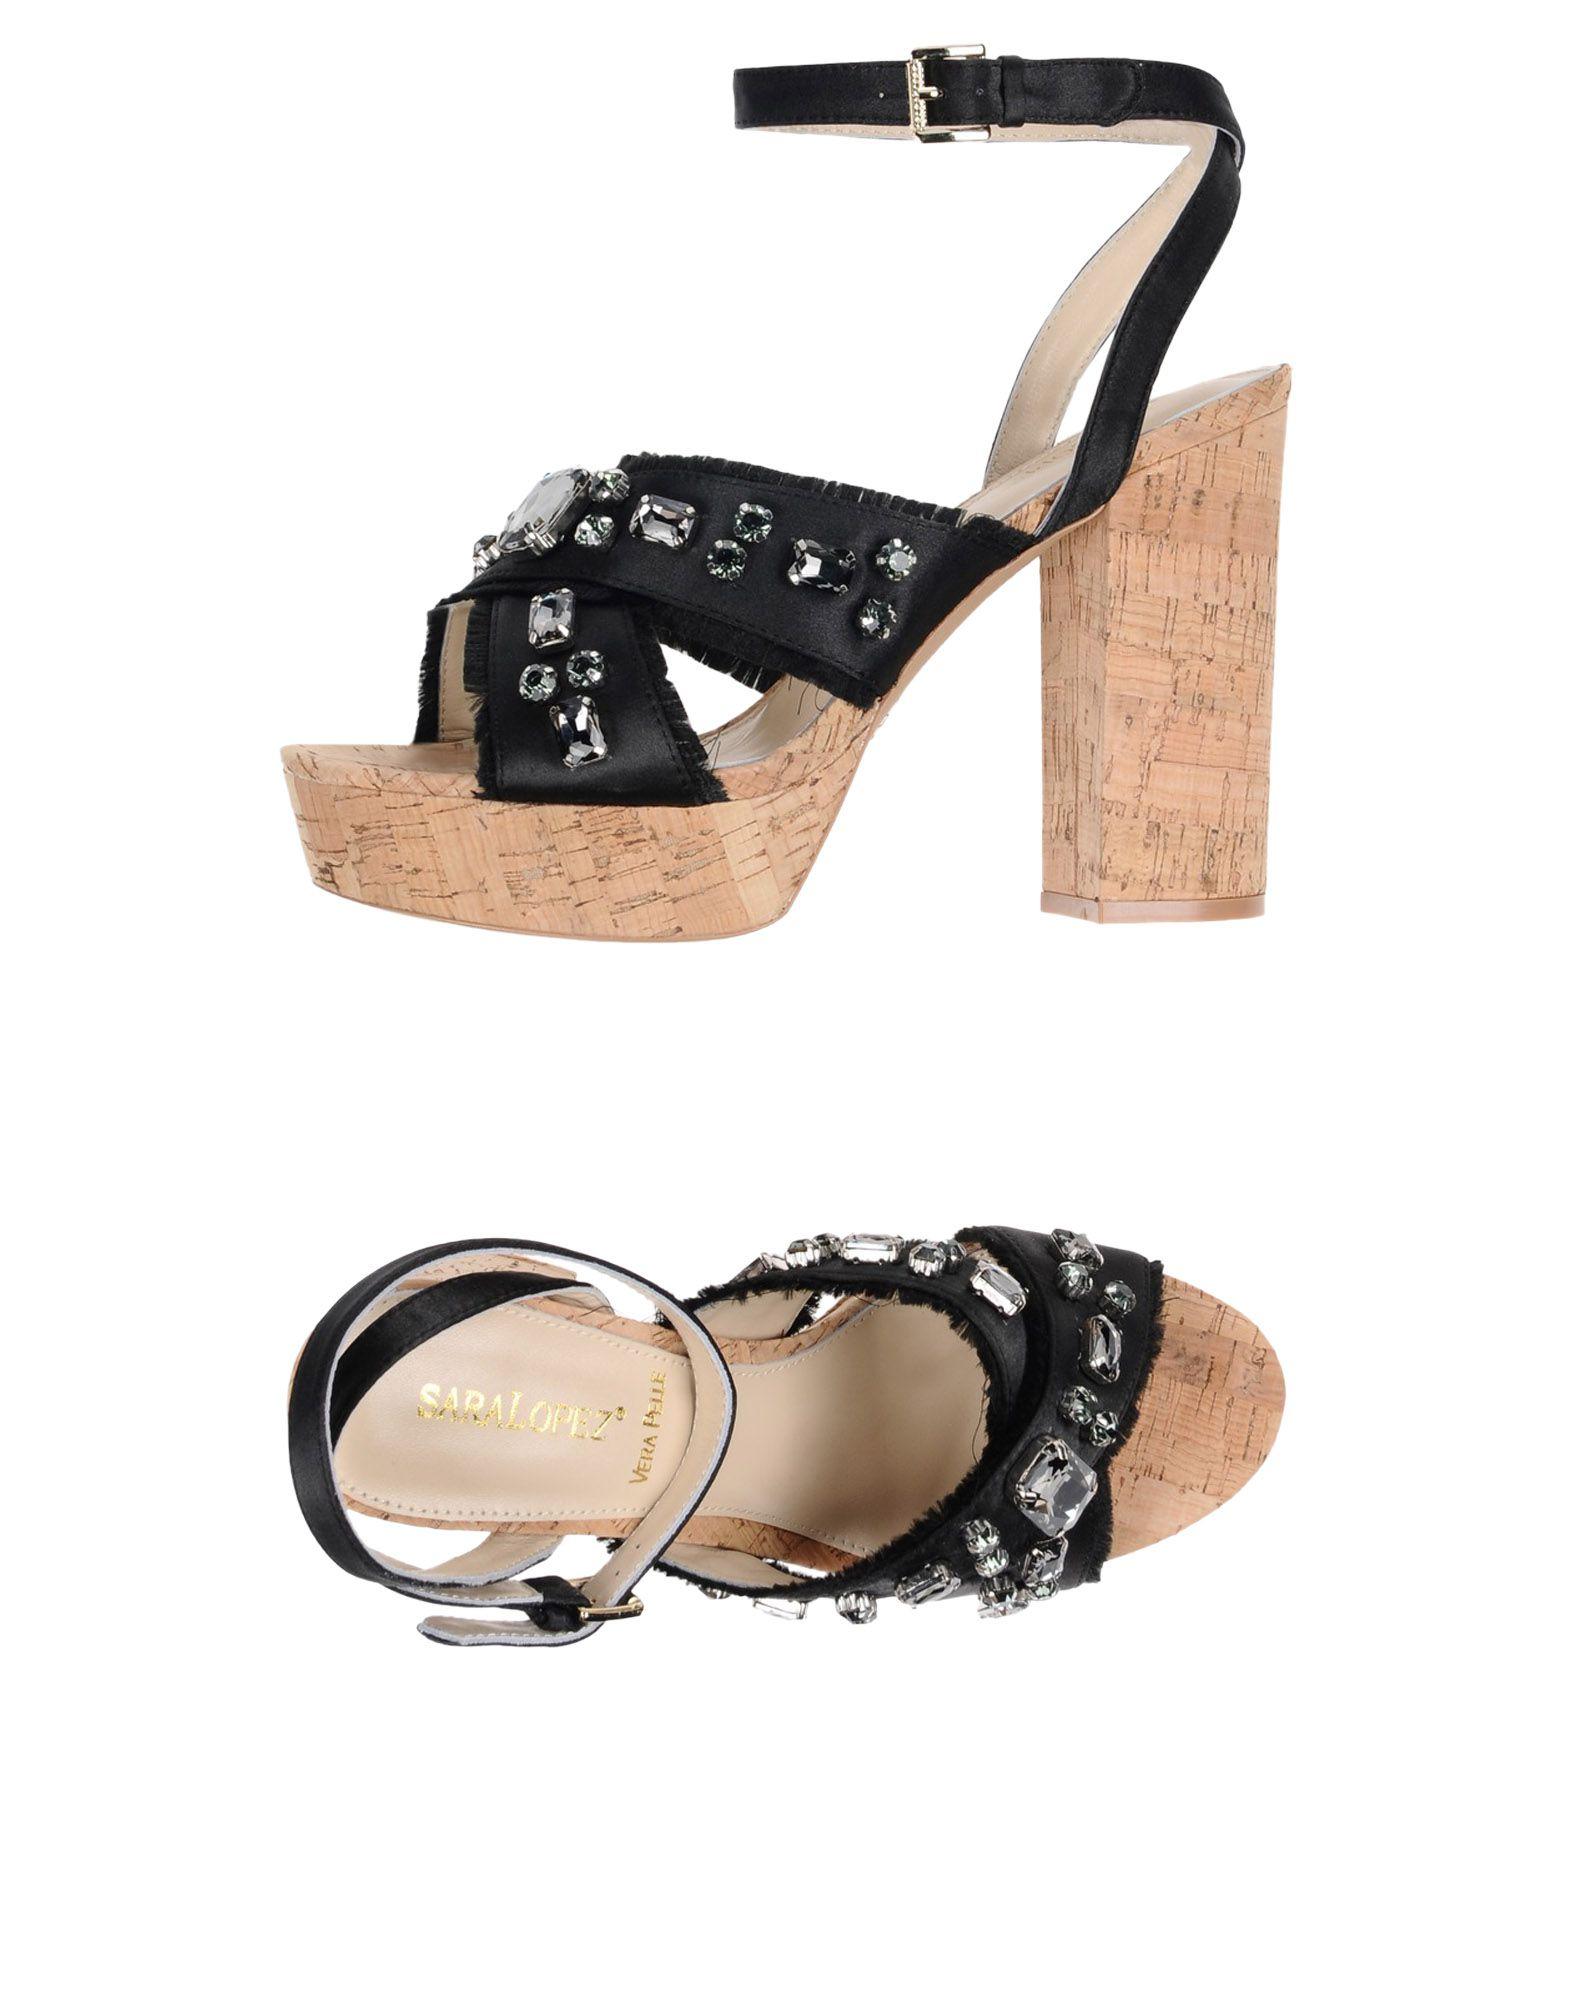 Sara López Sandalen Damen  11421781VD Gute Qualität beliebte Schuhe